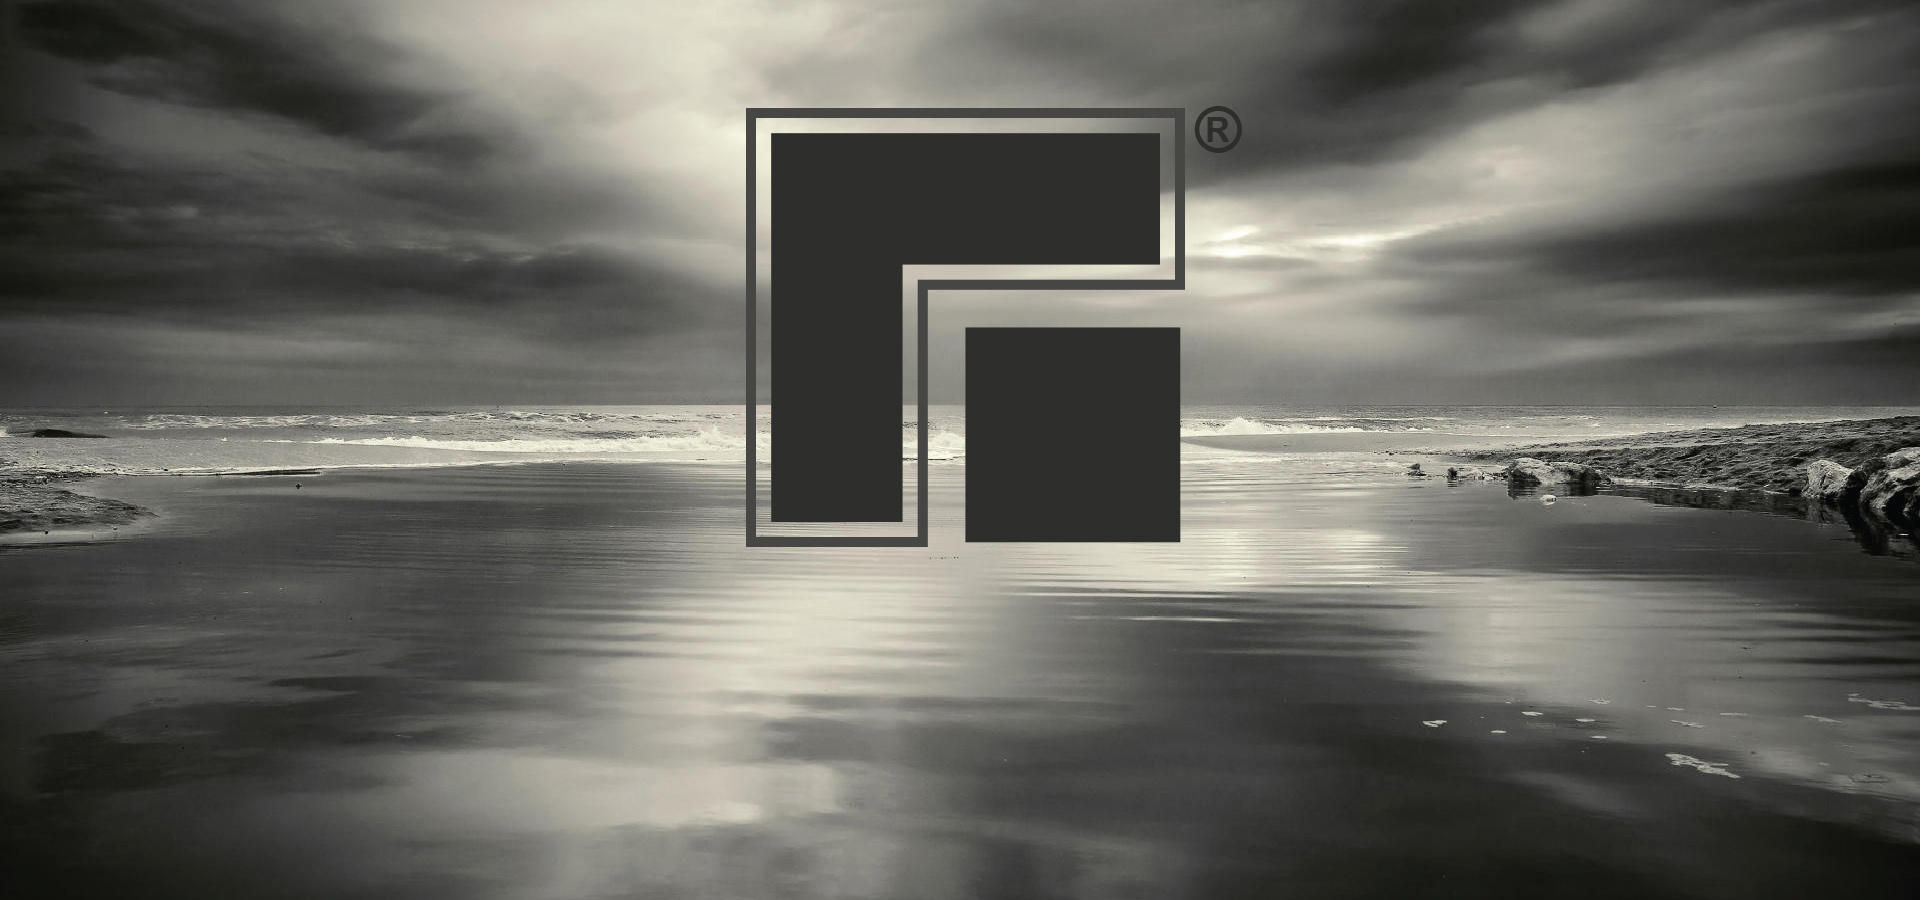 Compact Professional ‹ Mi Spot Diving Torchesfa Faamp; yN0vnm8Ow